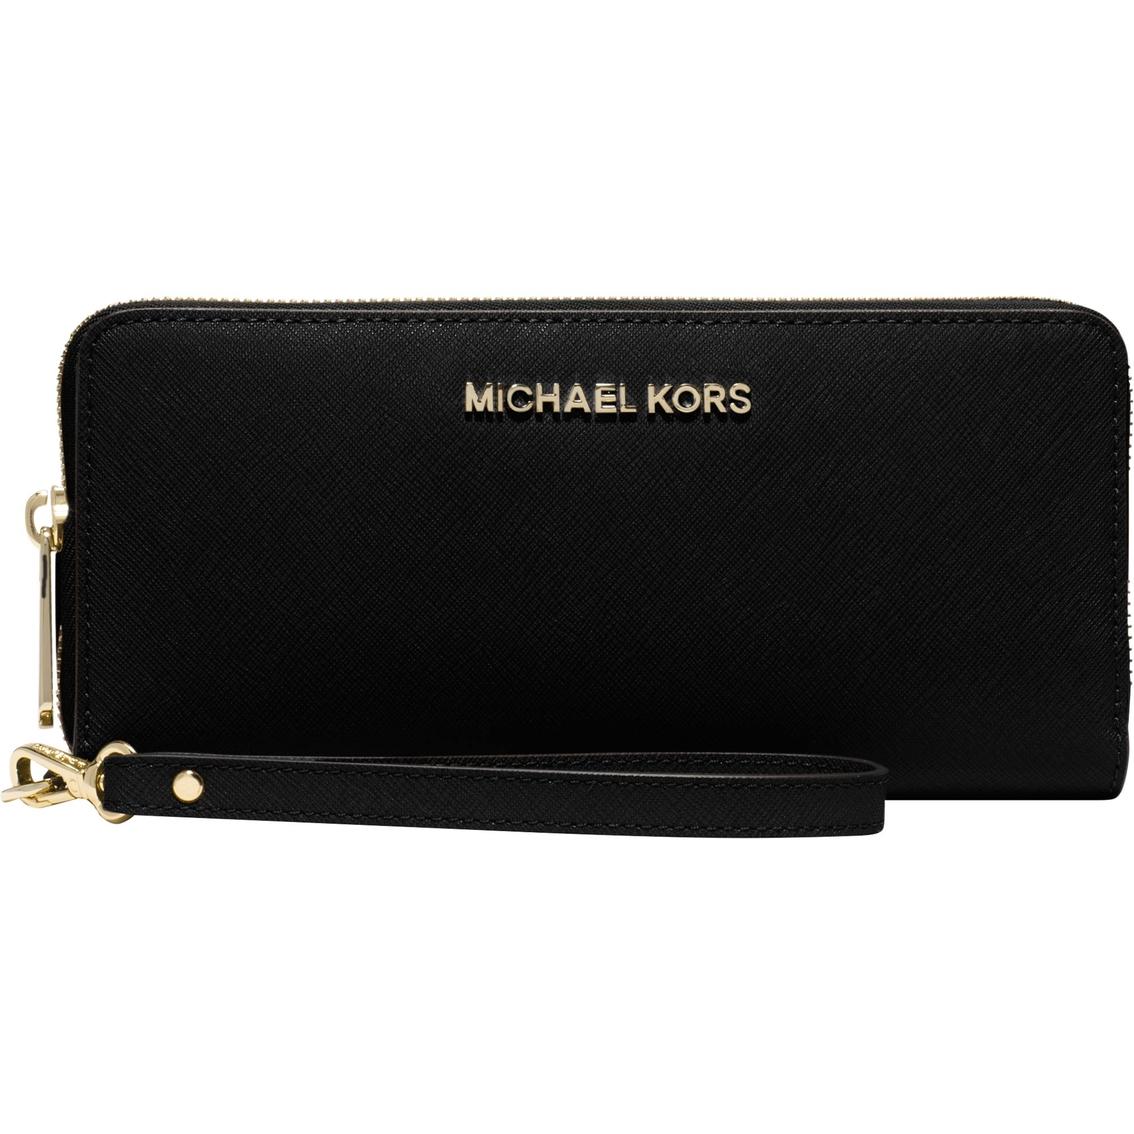 434268cb6ee6 Michael Kors Jet Set Travel Continental Wallet | Crossbody Bags ...